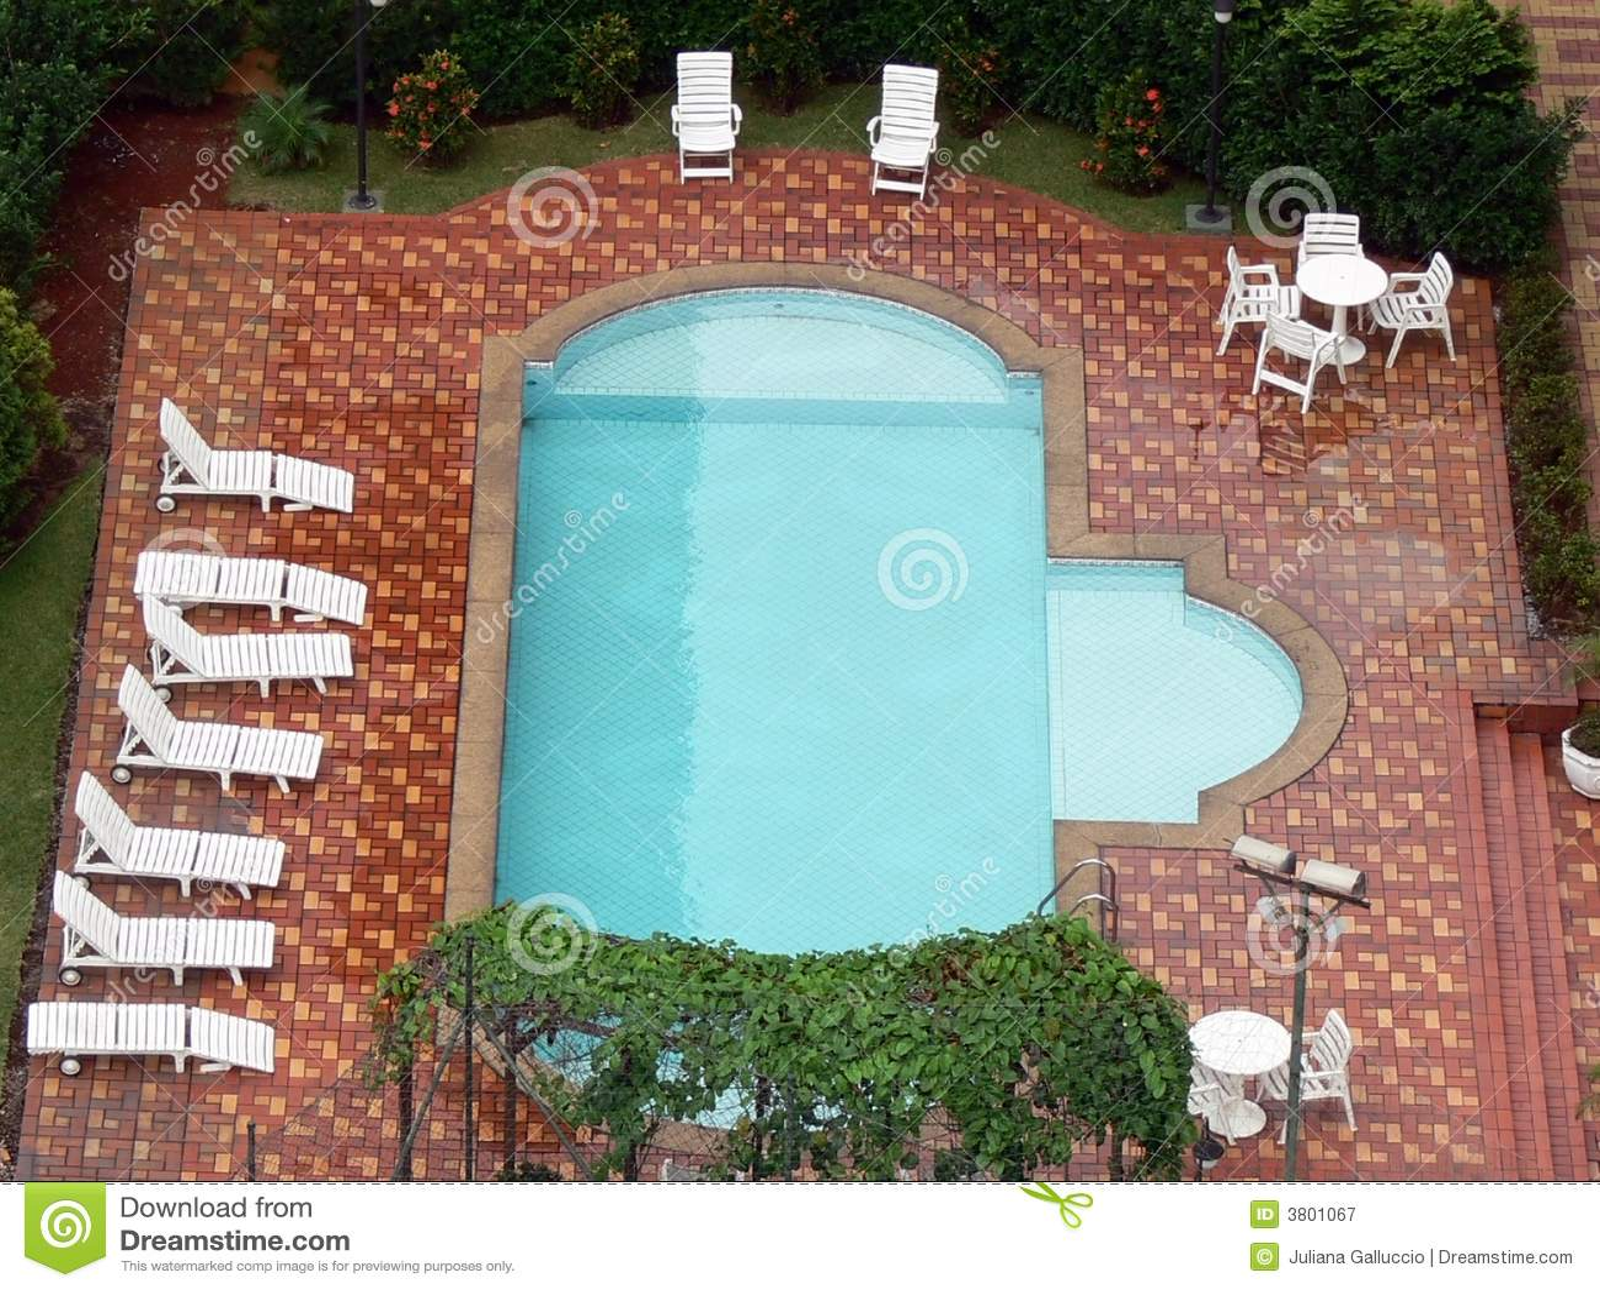 paradise hotel deltakere free6